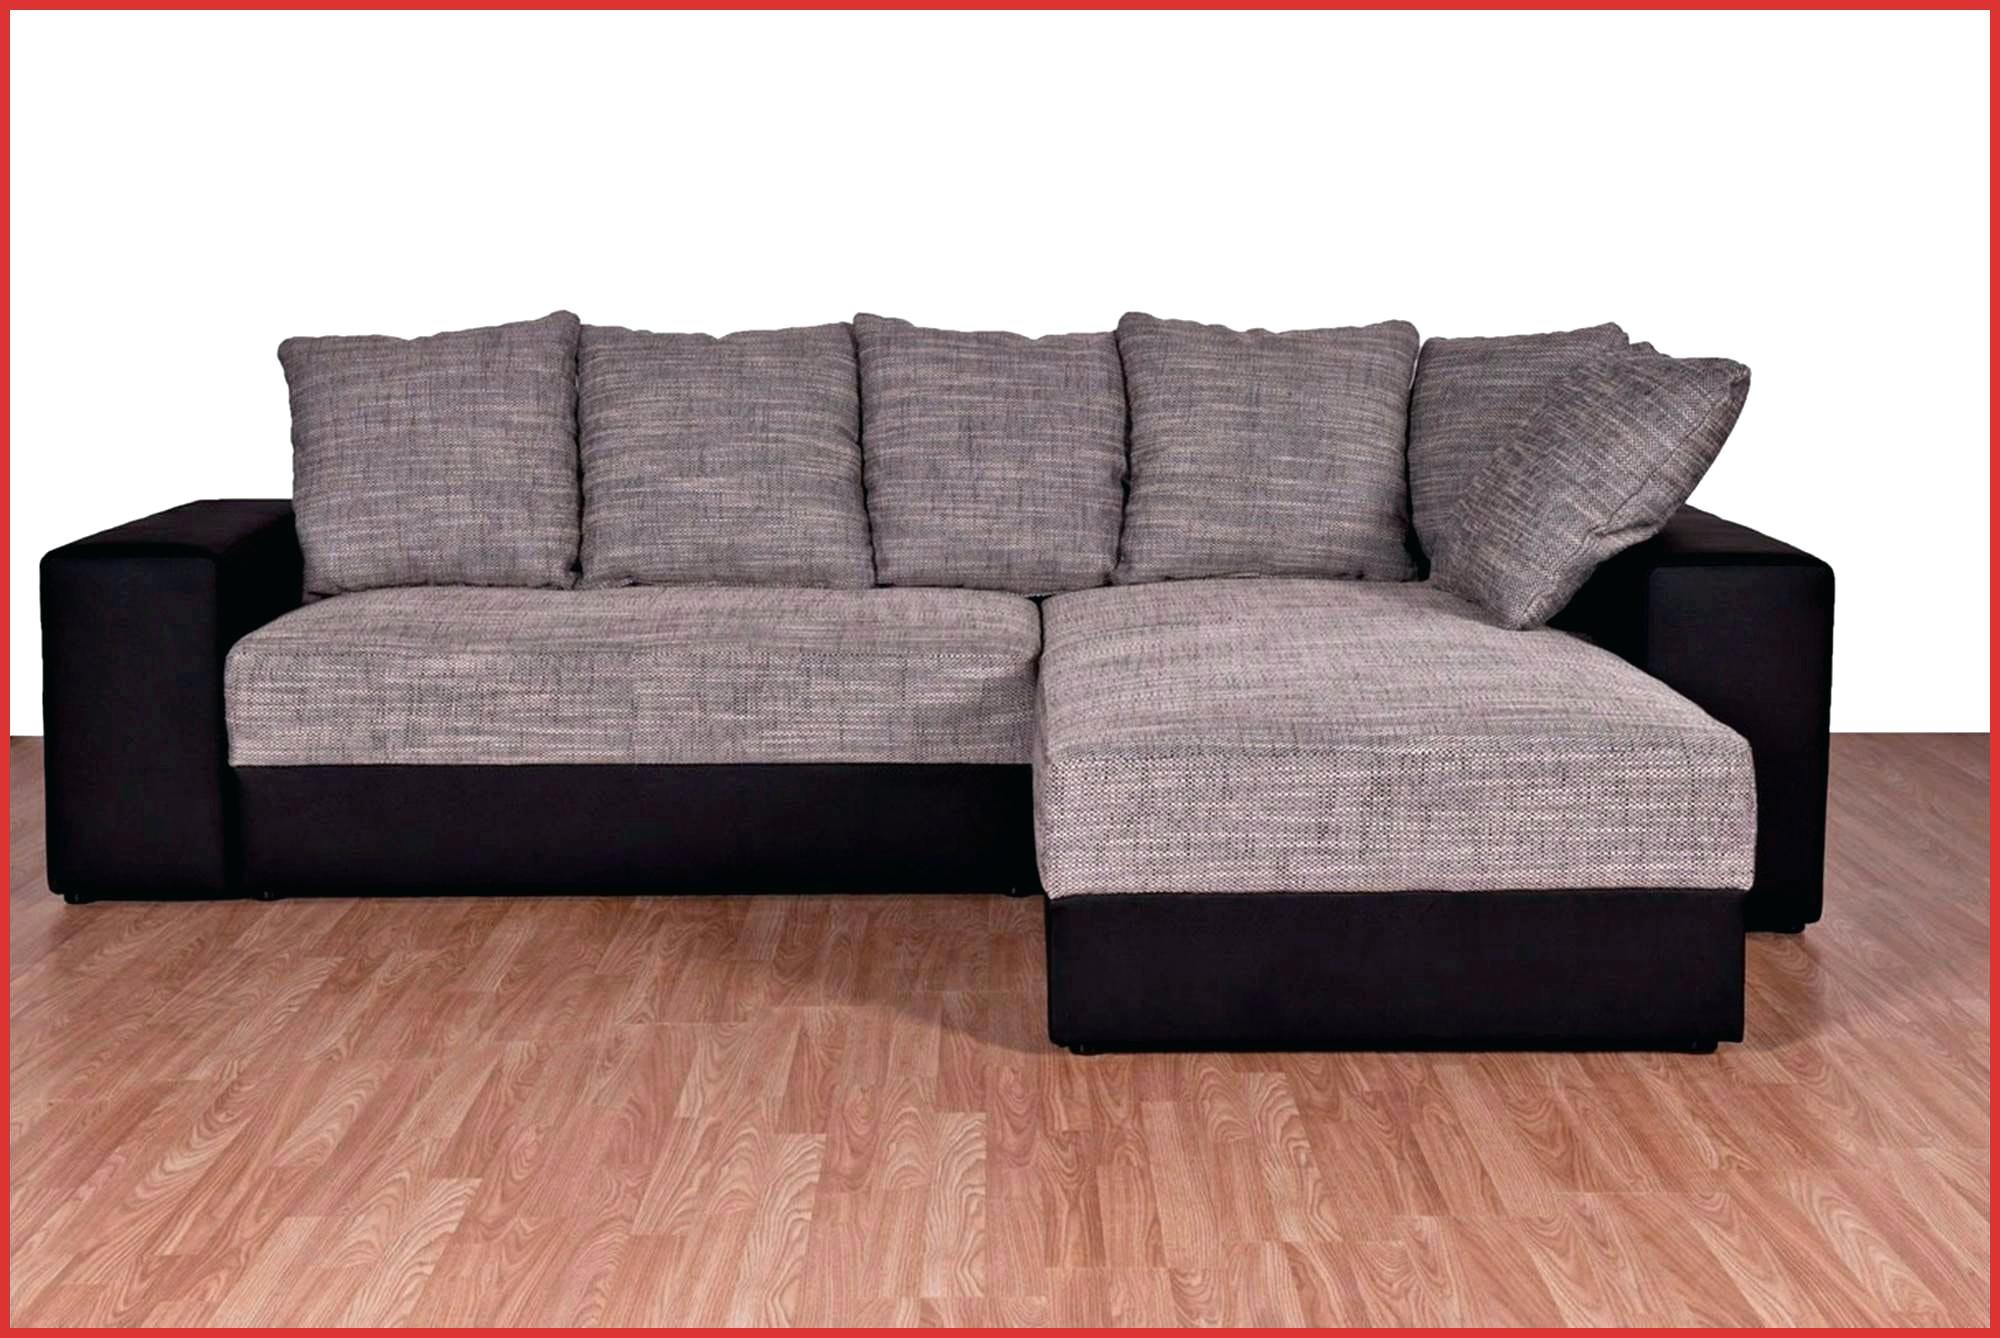 Canapé D Angle Ikea Convertible Luxe Photos Article with Tag Coussin Pour Meuble Exterieur